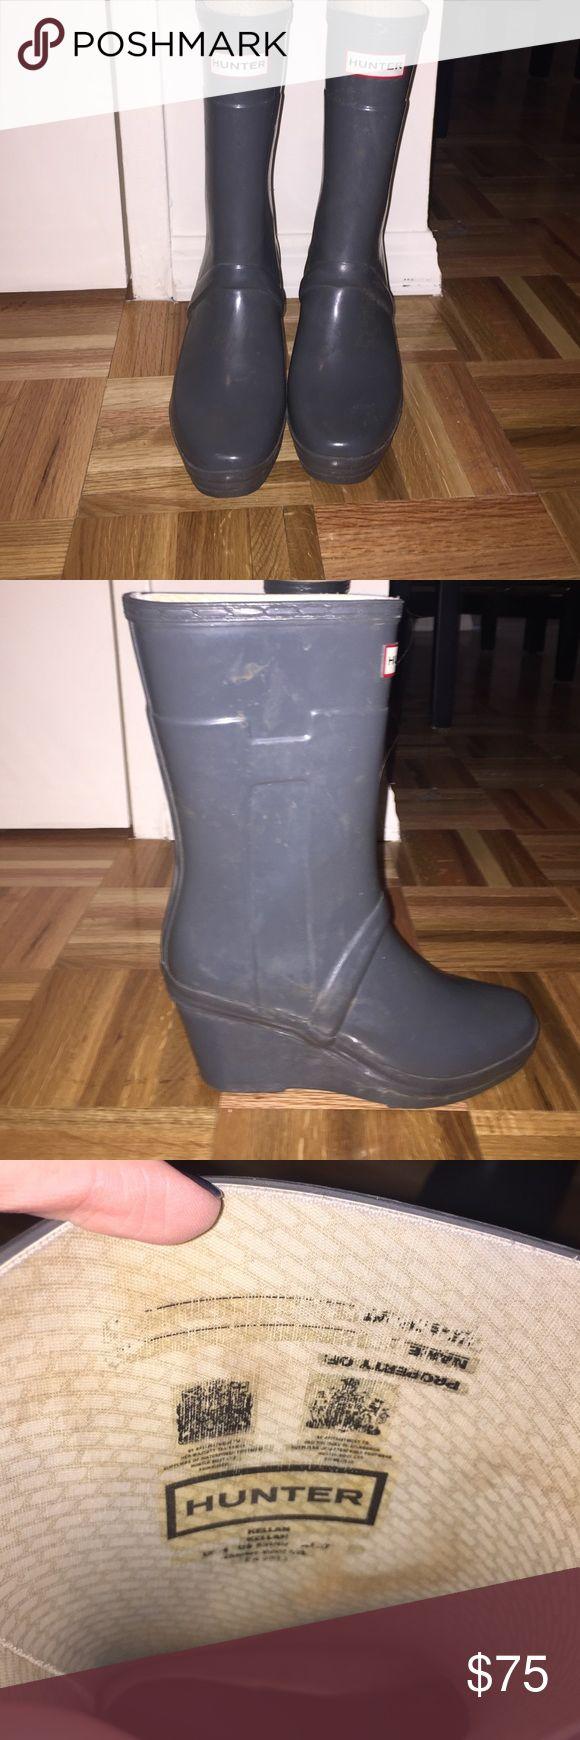 25+ best ideas about Grey Hunter Boots on Pinterest | Winter ...